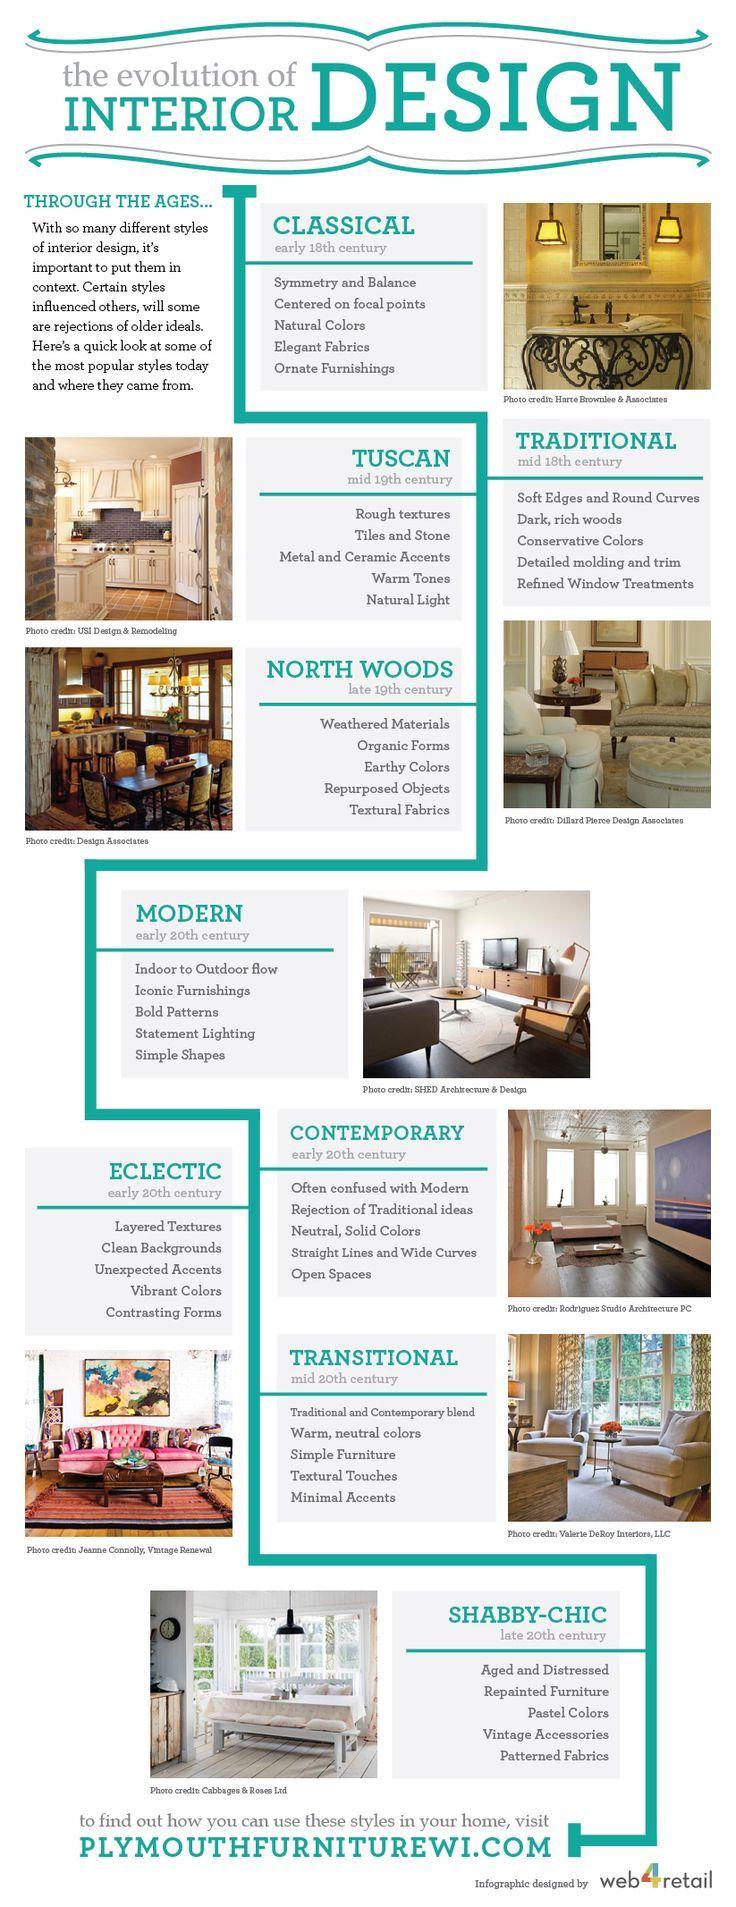 Interior Design Facts furniture design styles rococo style interior to decorating ideas